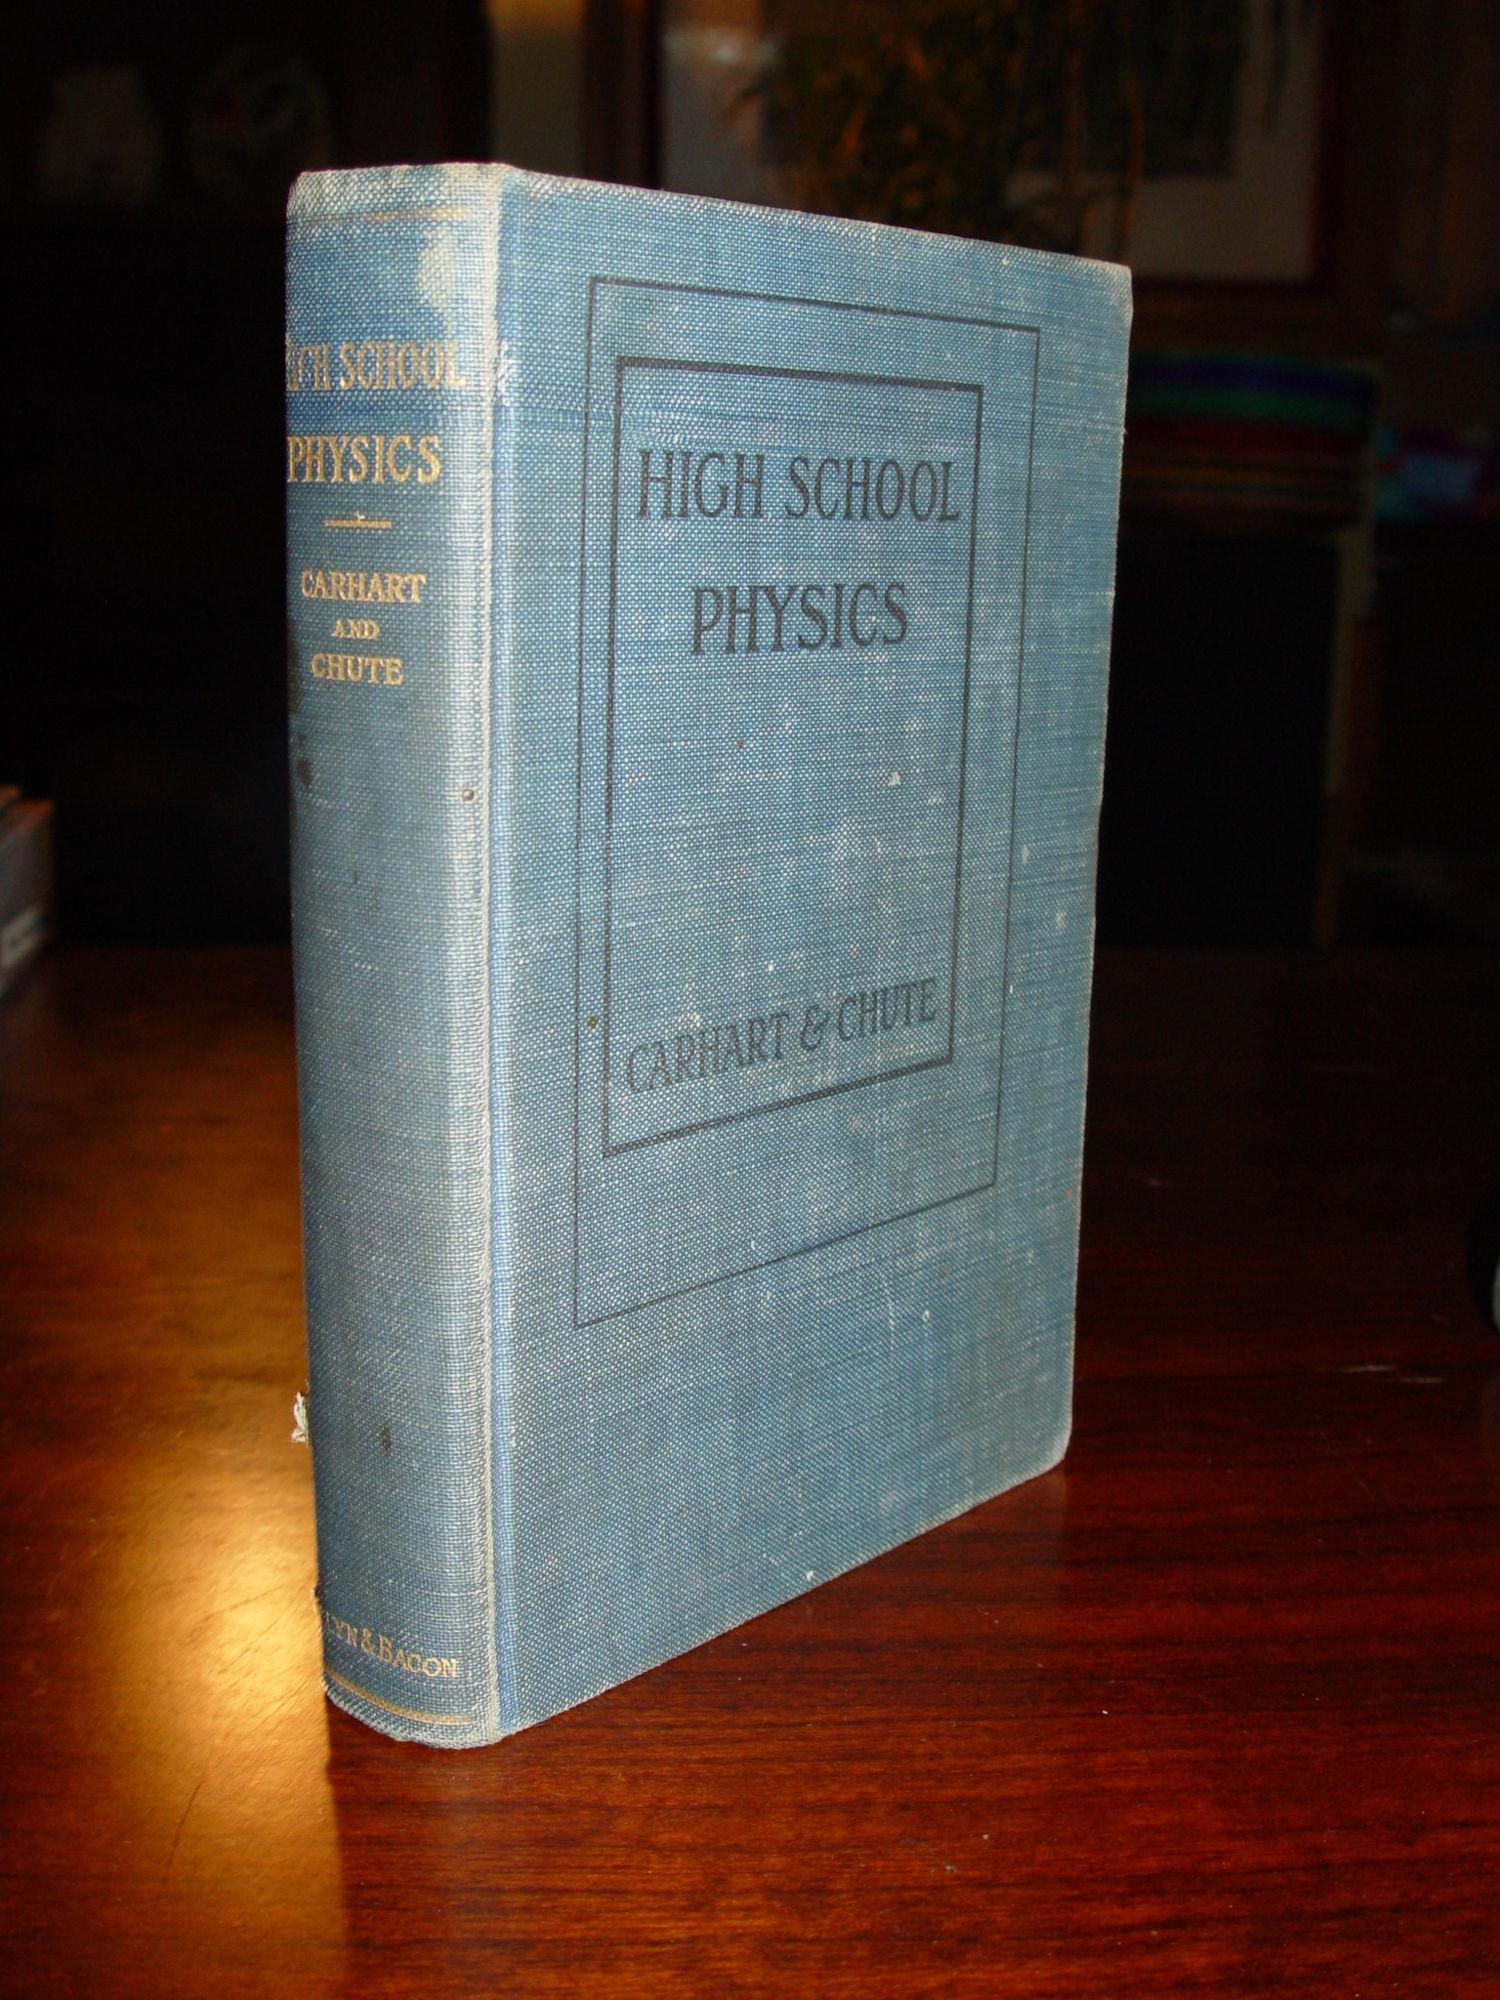 A Practical Beginning to                                         Successful Rabbit Raising ~ ARBA                                         The American Rabbit Breeders                                         Association ILL (1973)